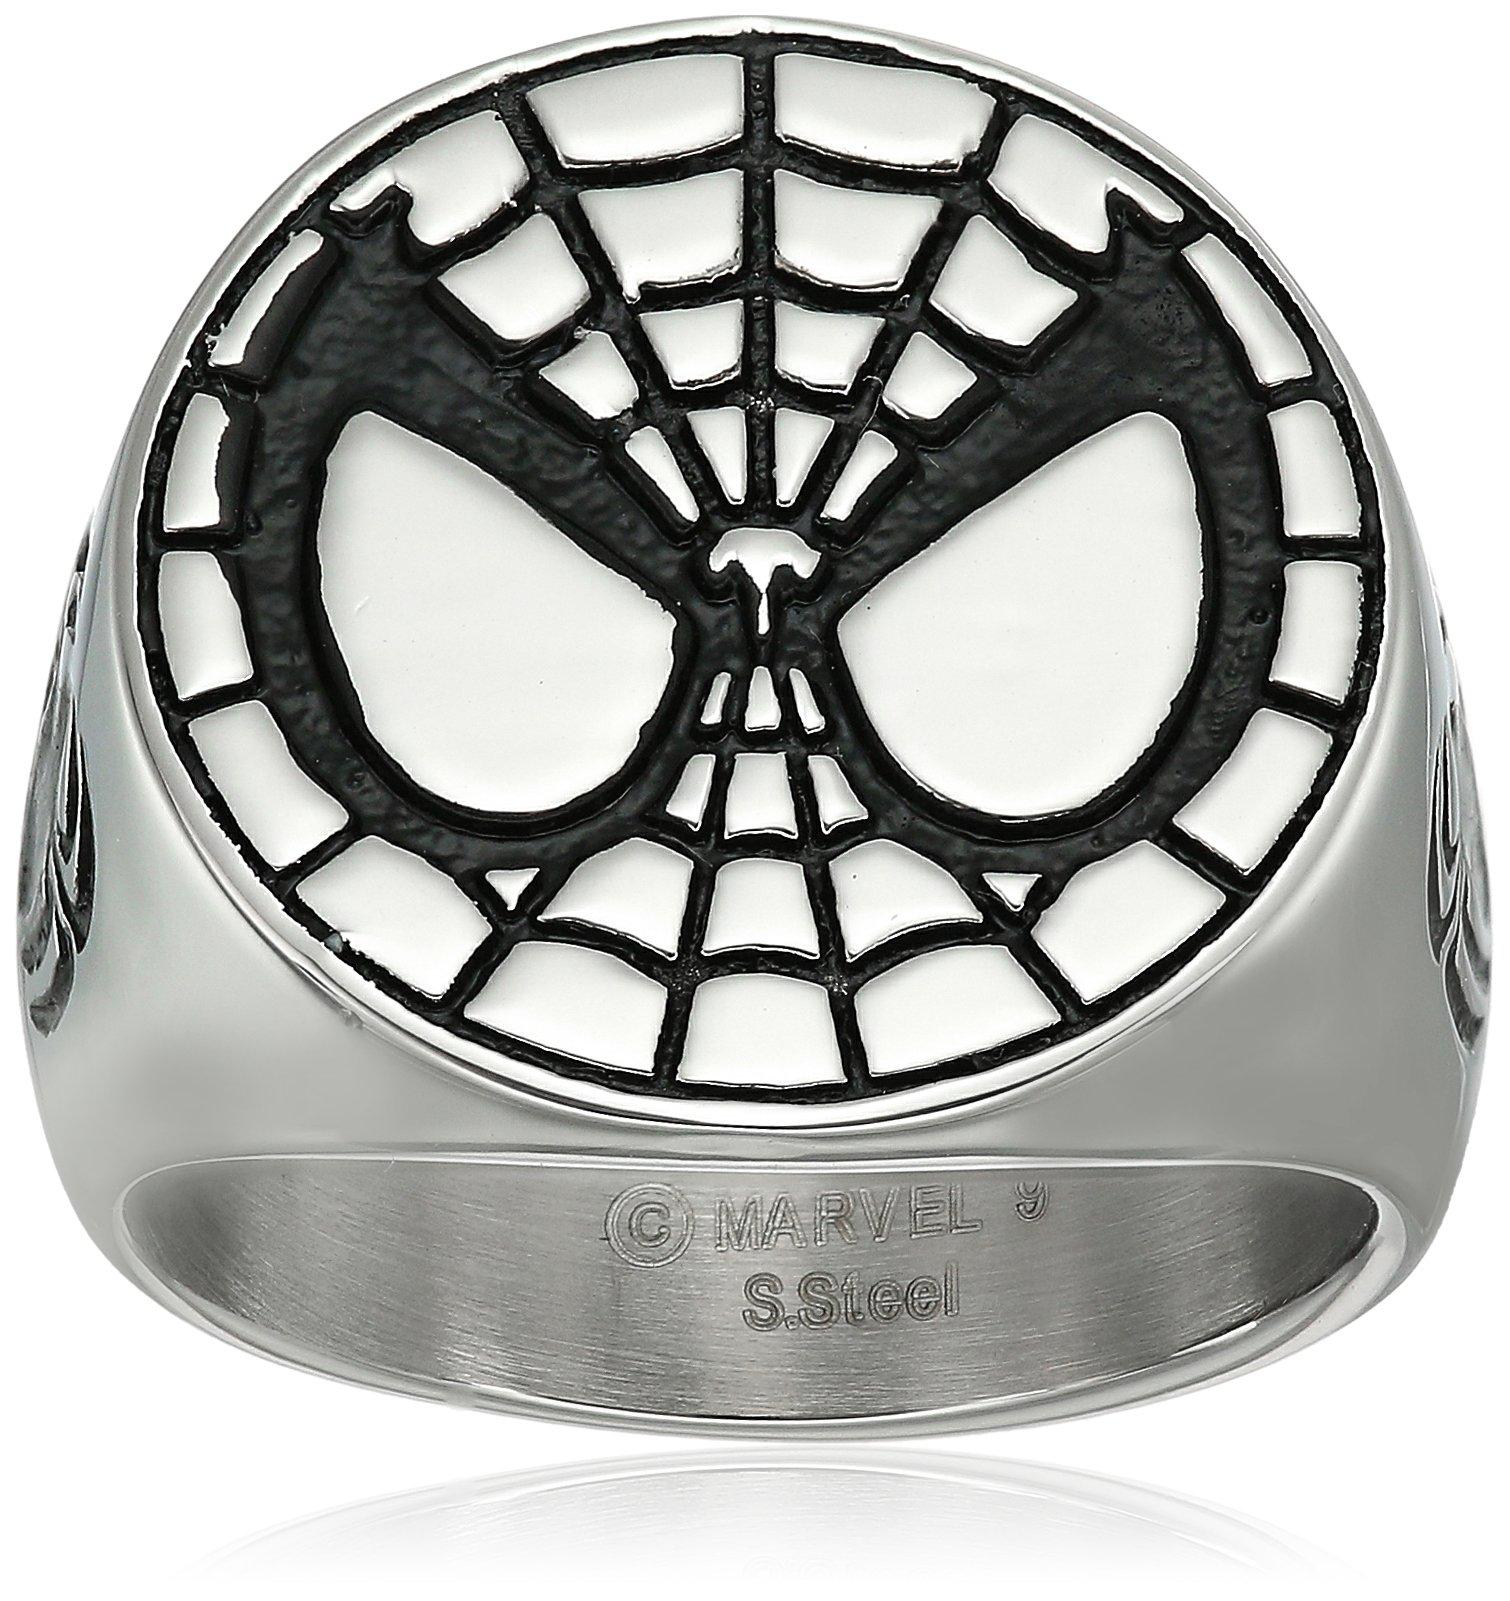 Marvel Comics Spider-Man Stainless Steel Men's Ring, Size 11